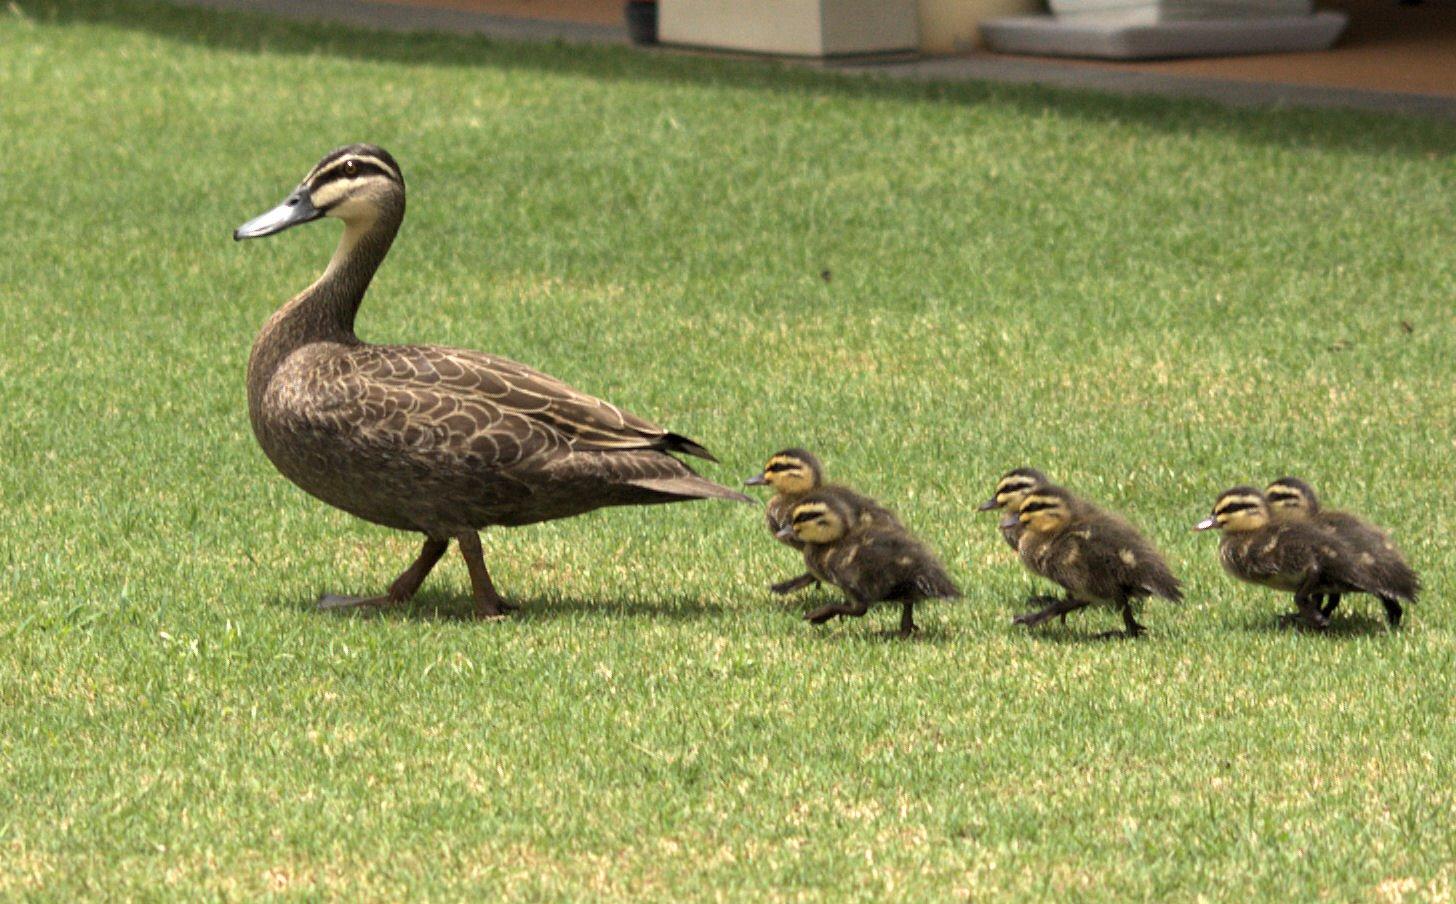 https://upload.wikimedia.org/wikipedia/commons/d/d8/Duck_%26_Ducklings_Morning_Walk.jpg